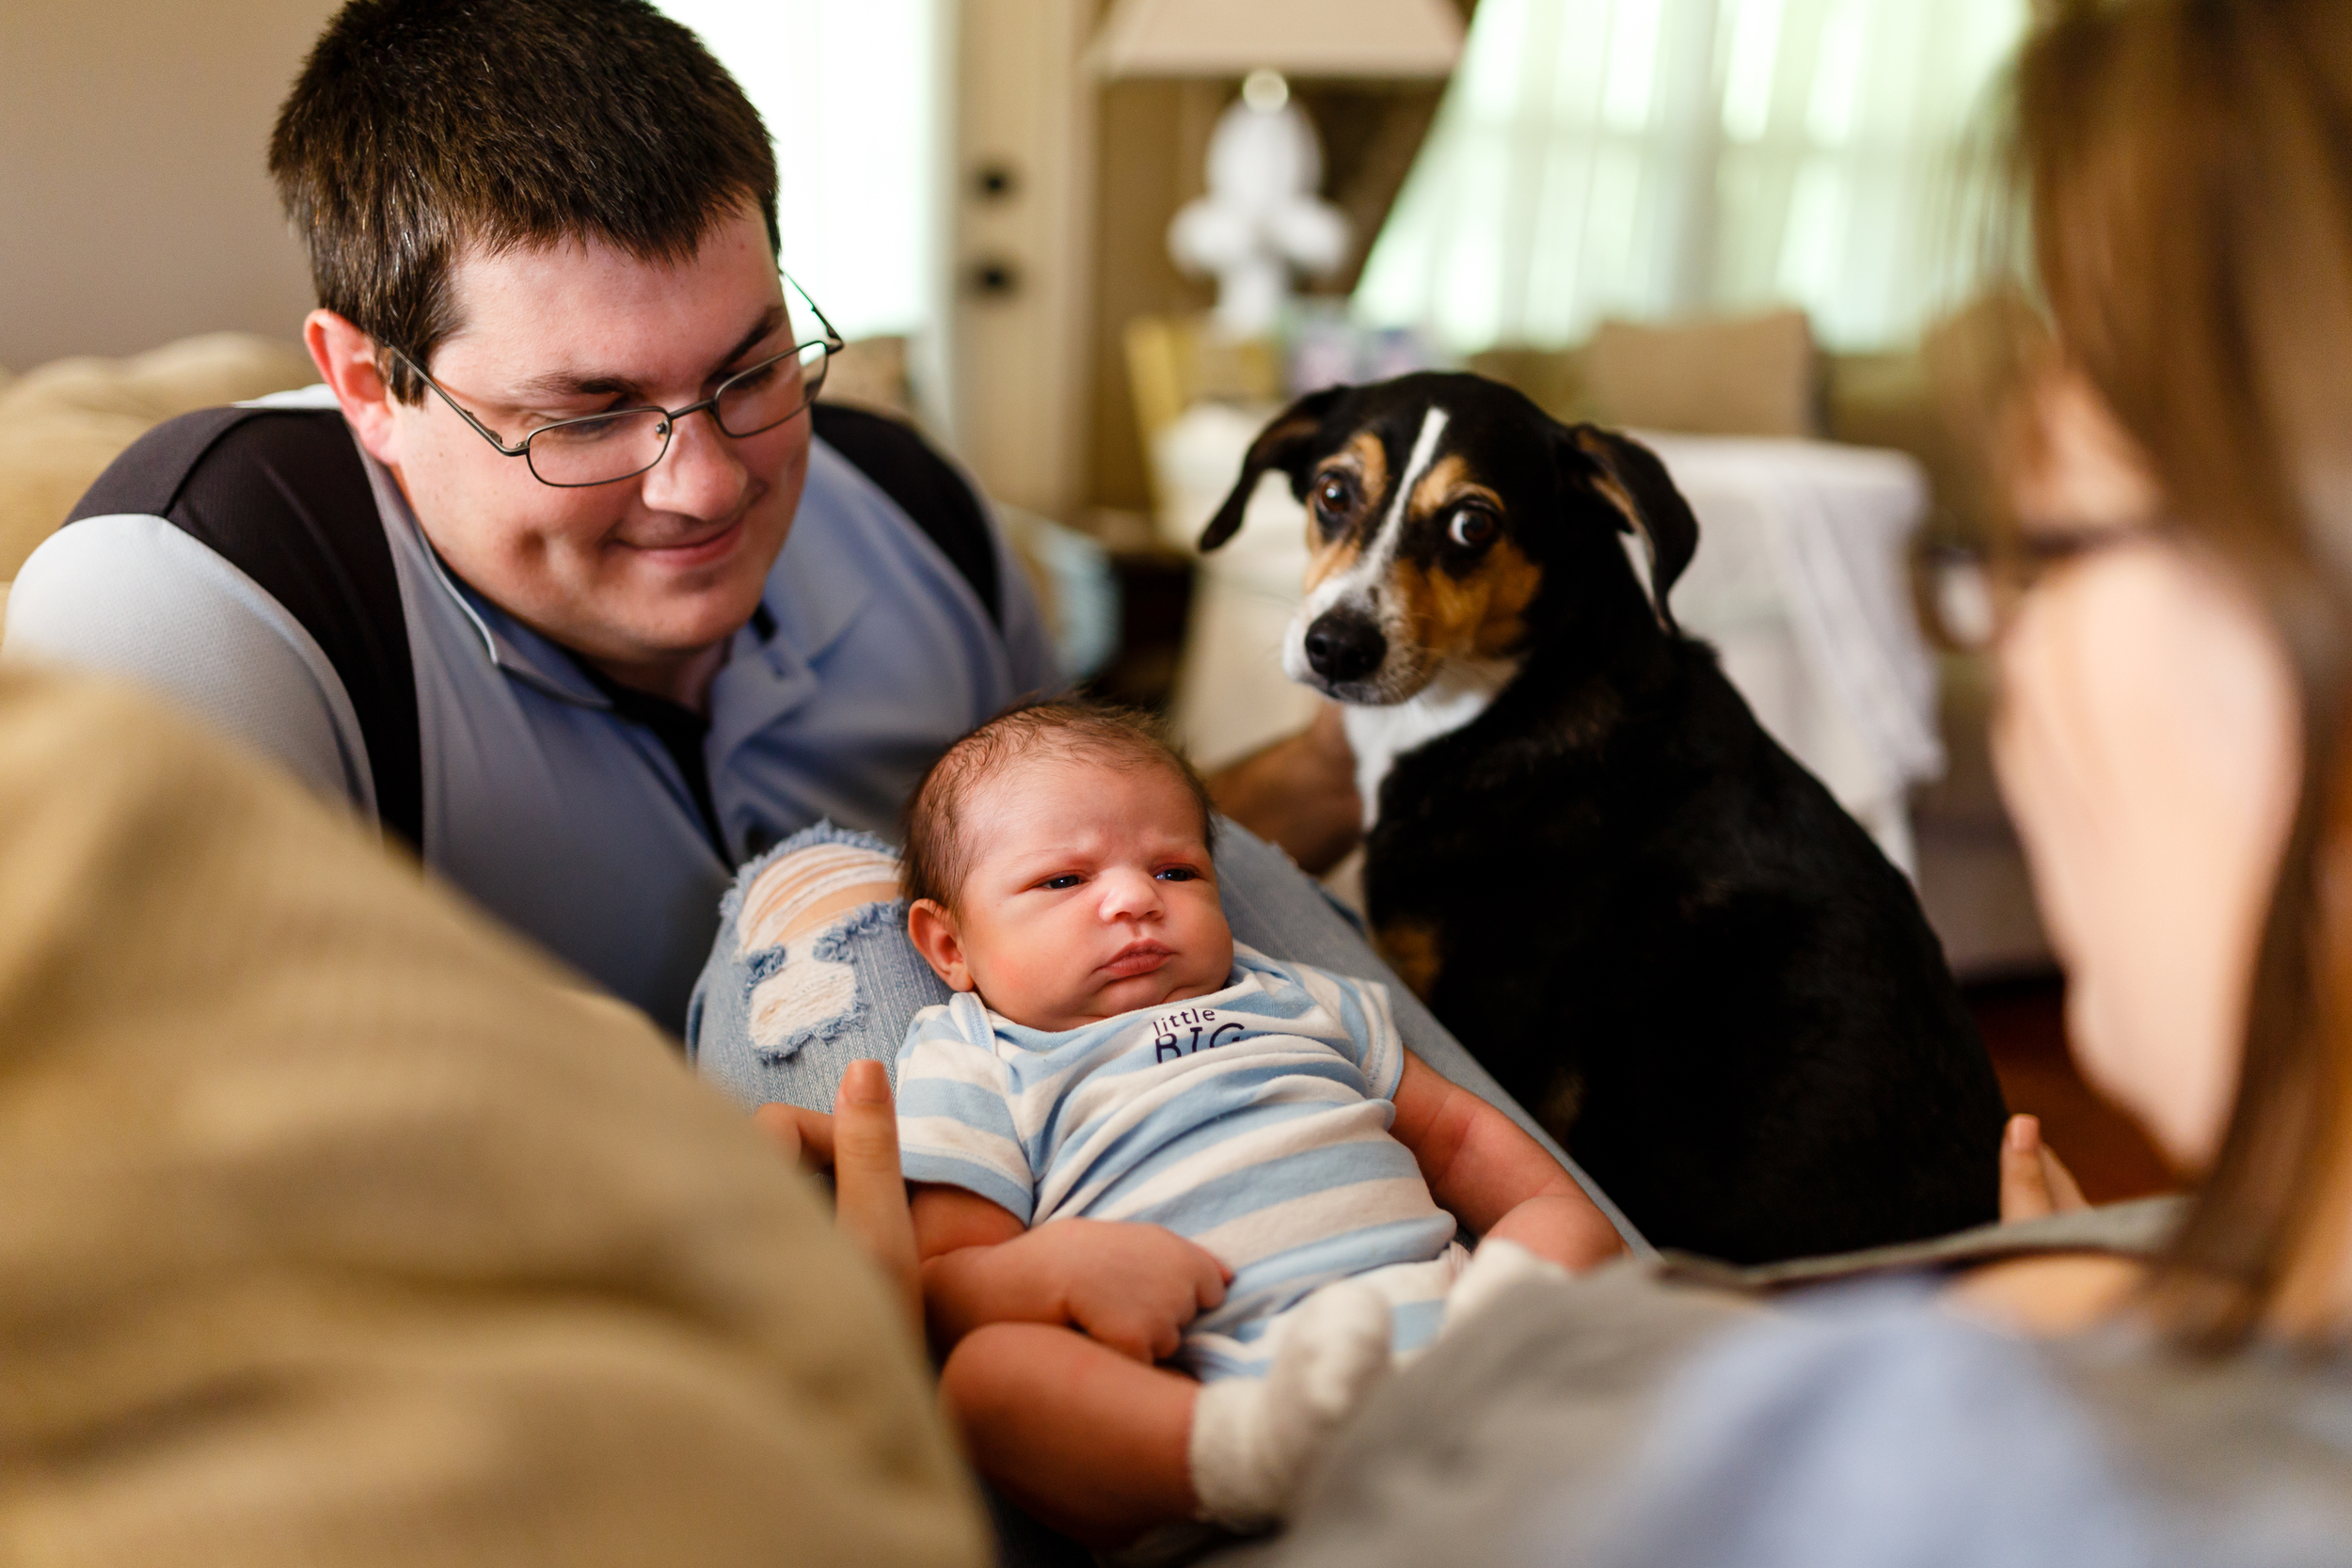 Newborn-baby-lifestyle-portrait-lafayette-broussard-youngsville-photographer-5.jpg